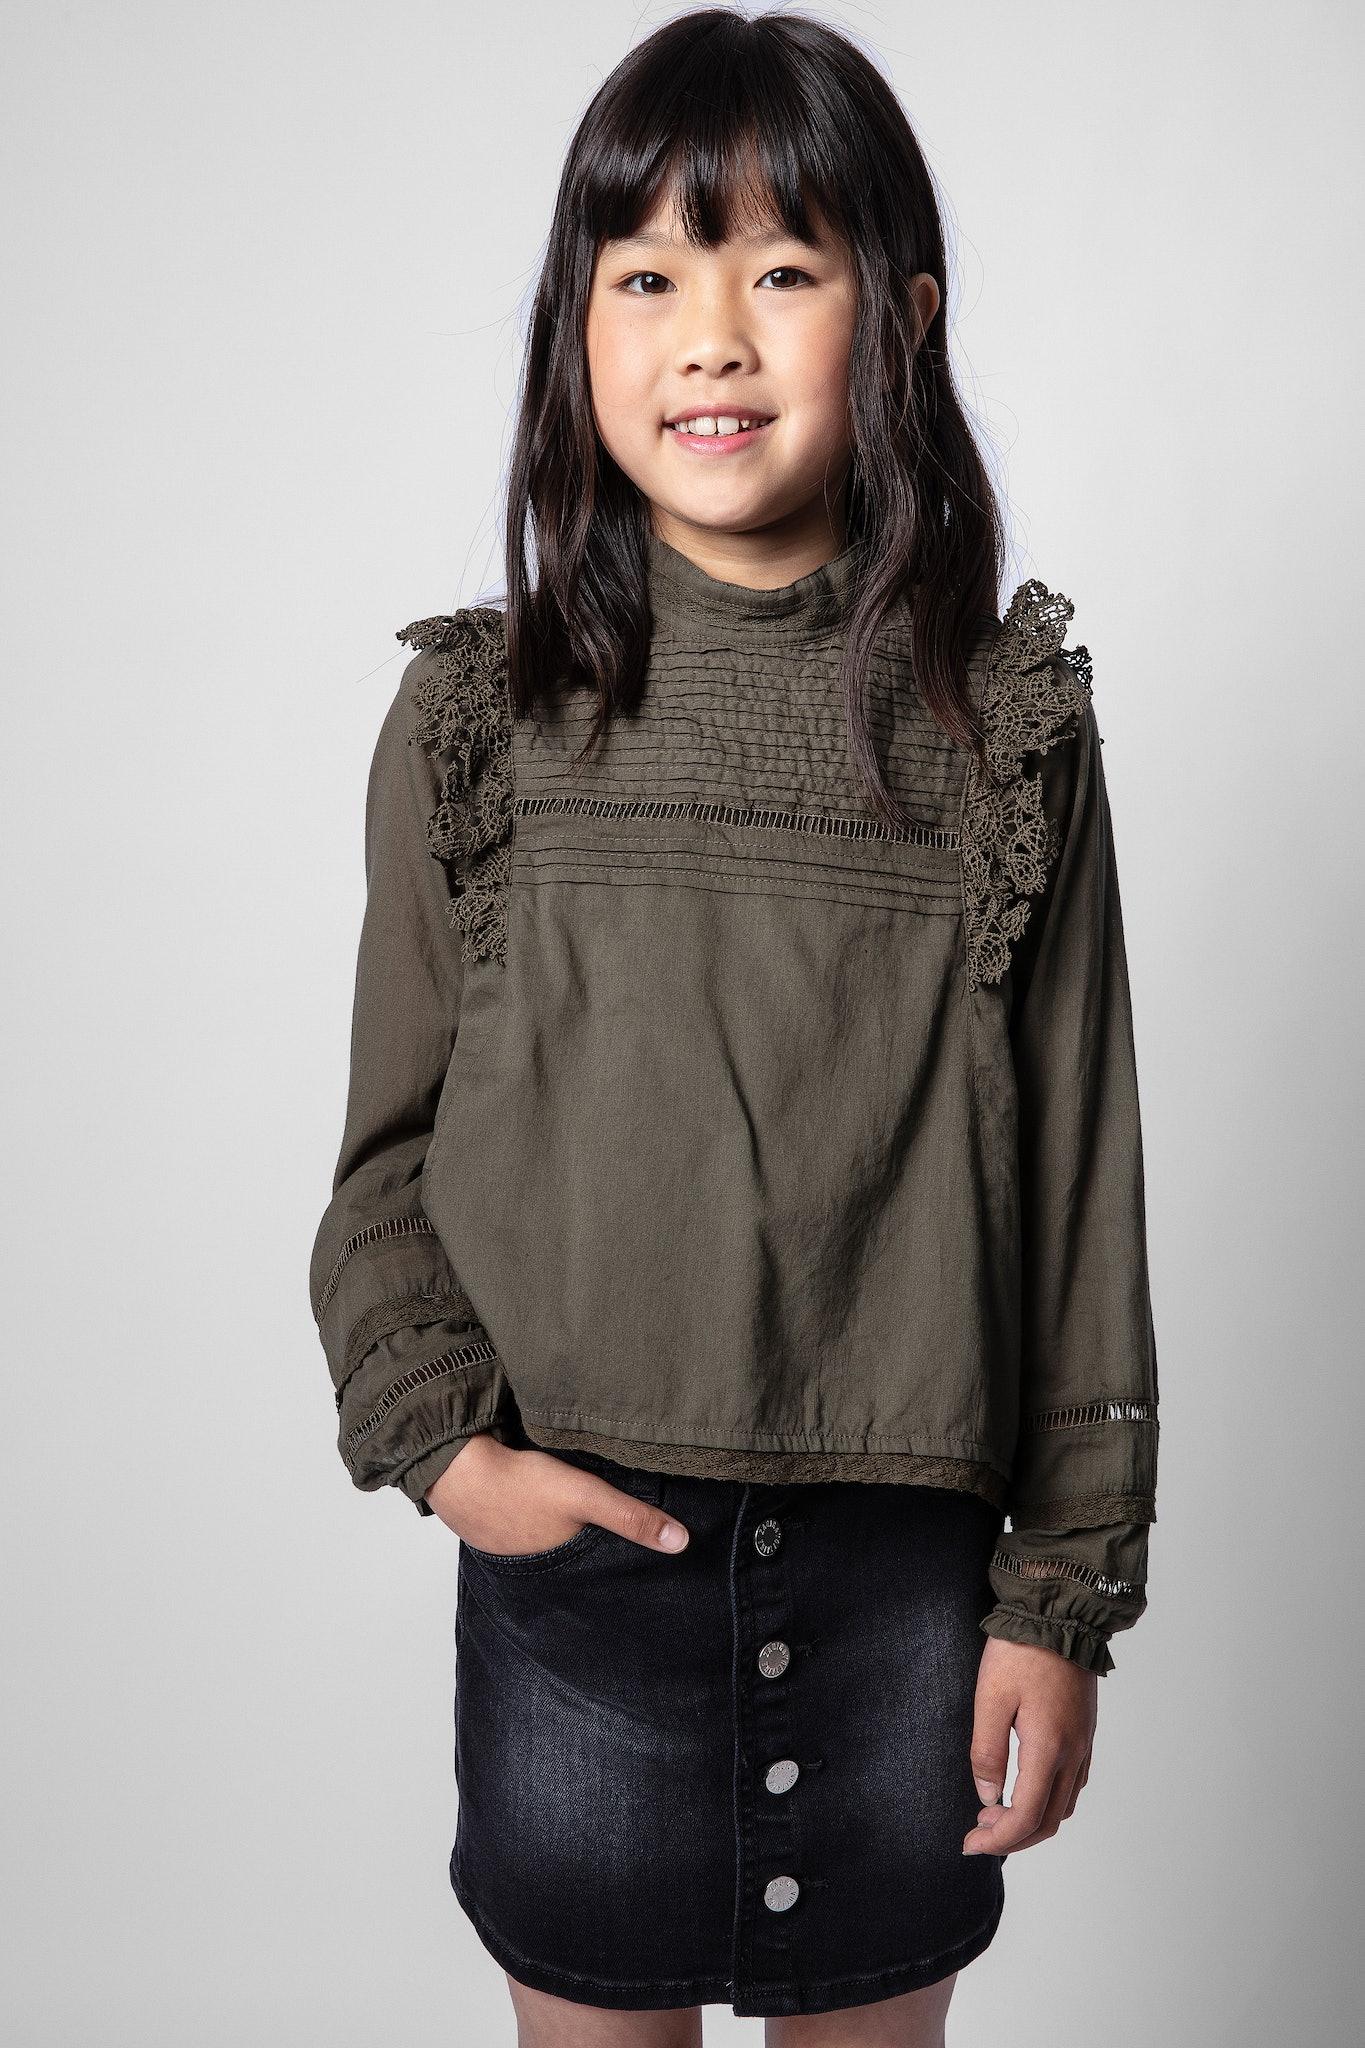 Ivy Enfant Blouse